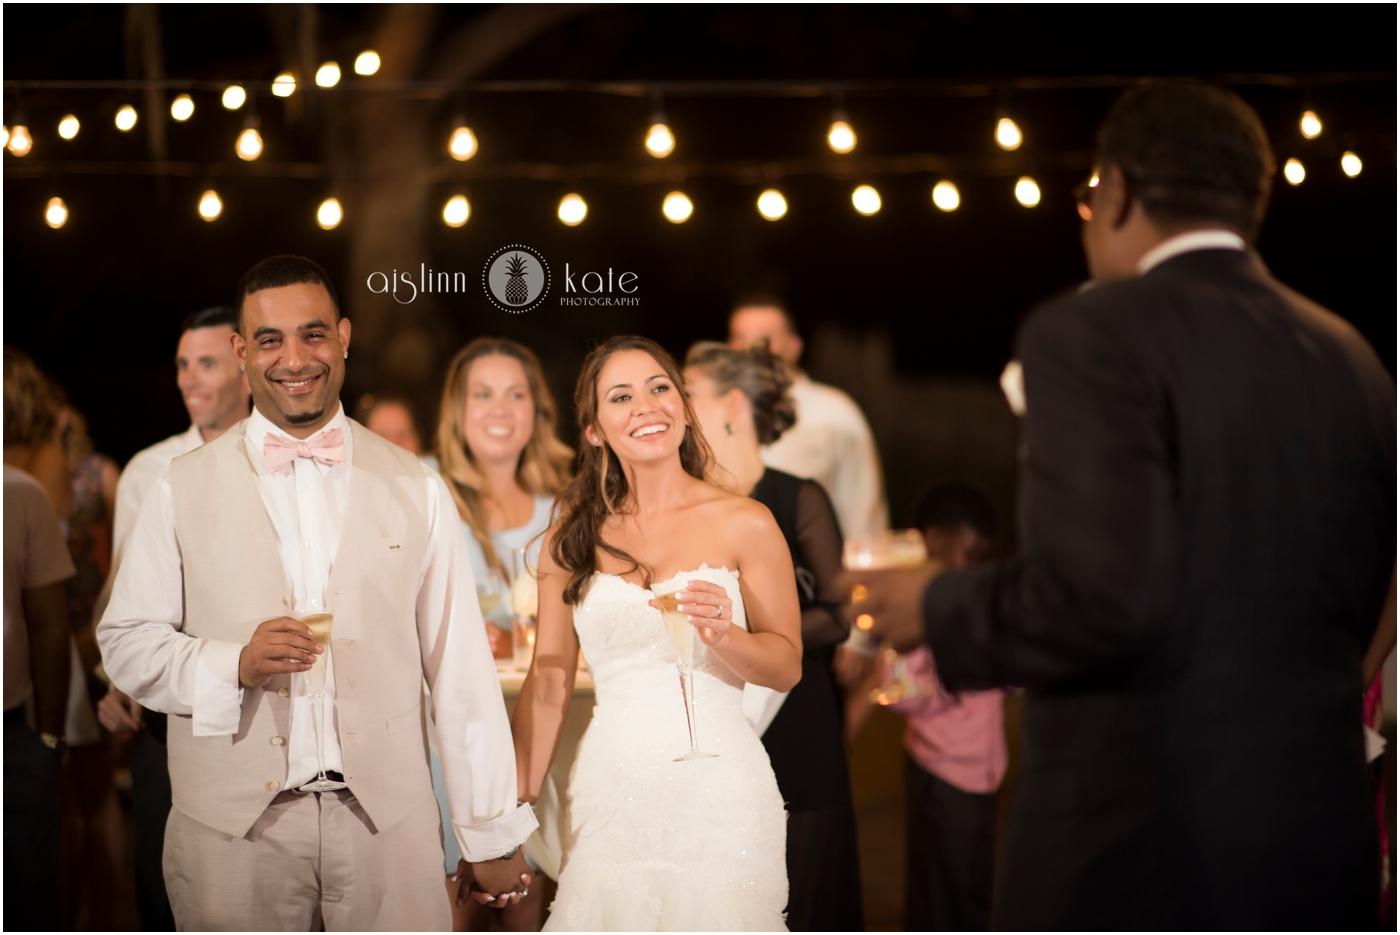 Pensacola-Destin-Wedding-Photographer_8773.jpg